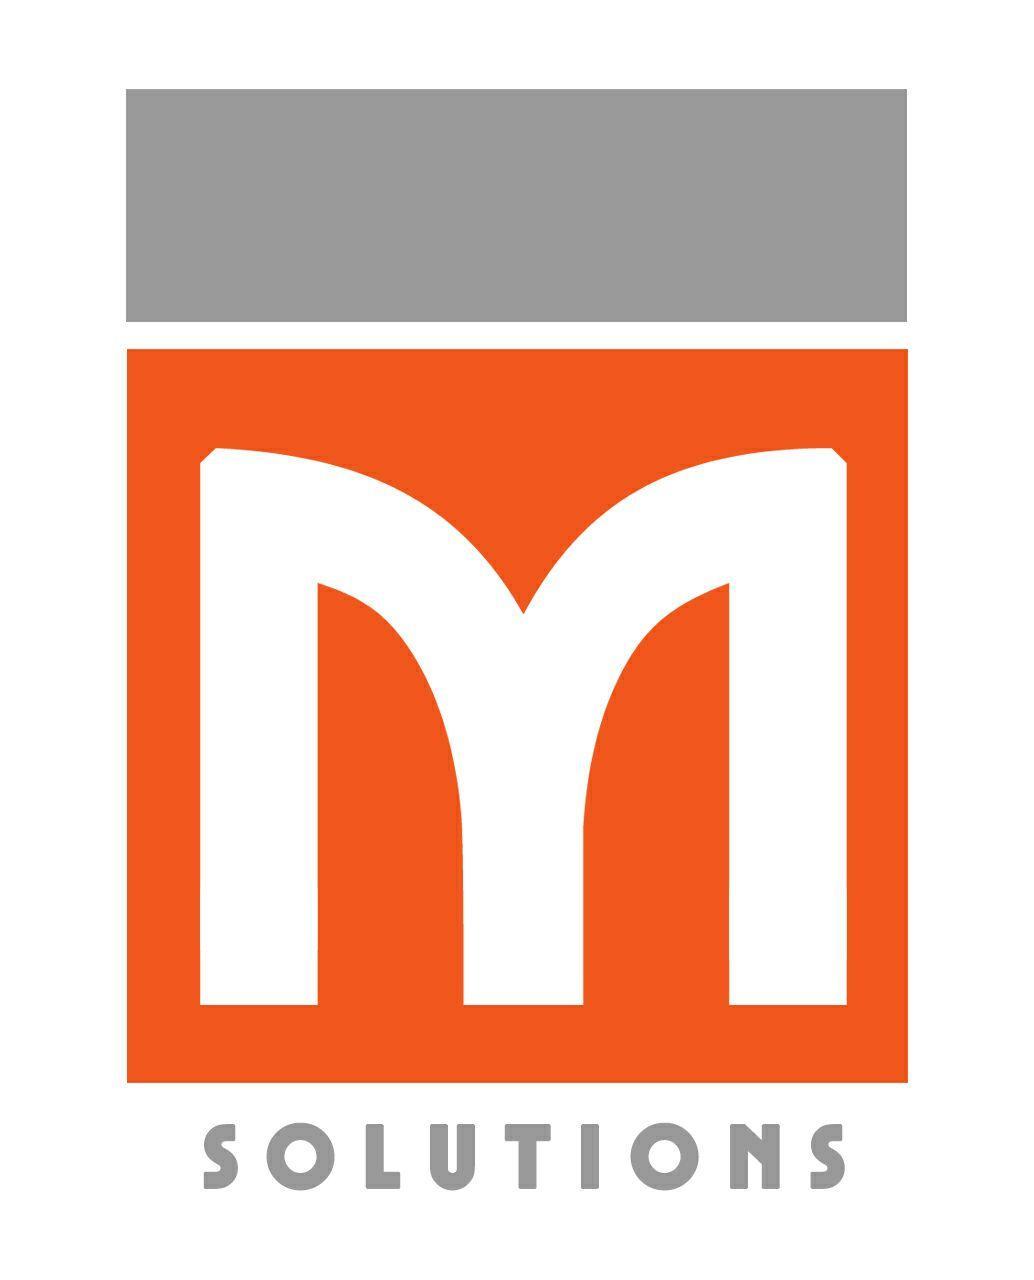 Msolutions